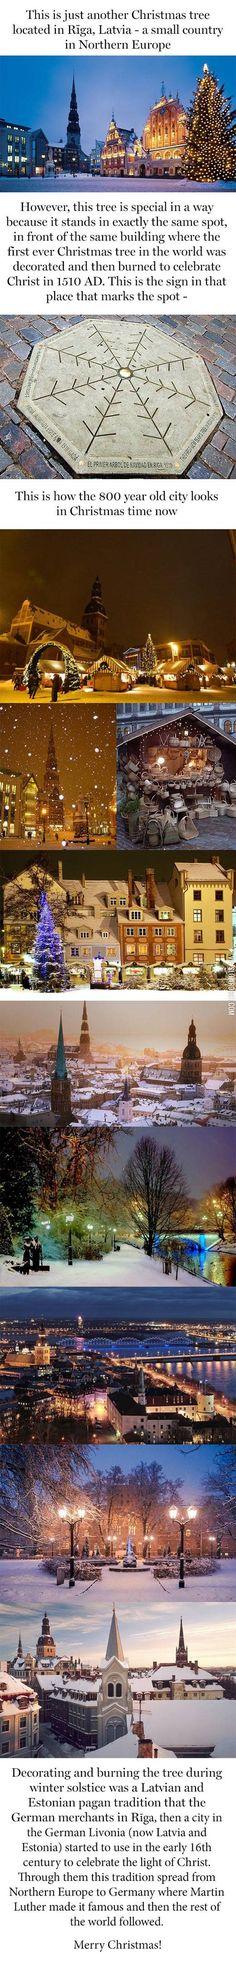 The Place, - Riga, Livonia (Now Latvia & Estonia) Of The THE FIRST CHRISTMAS TREE!